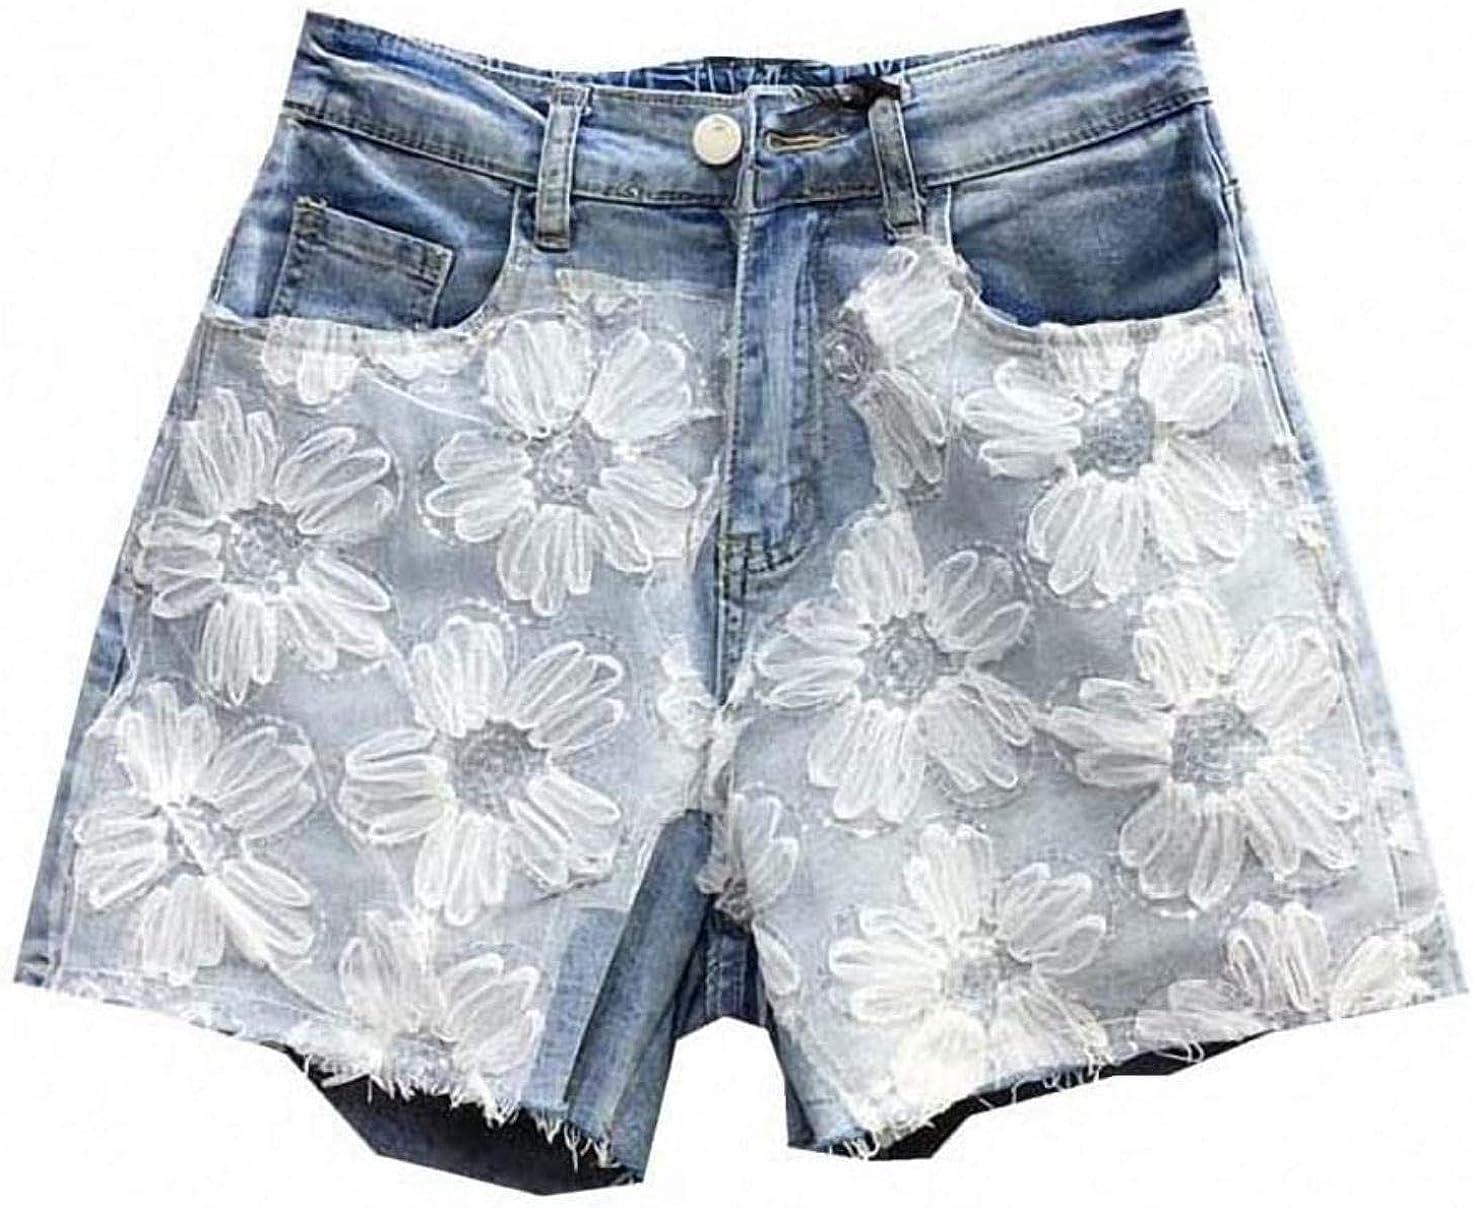 Tayaho High Waist Denim Shorts Women Mesh Patch Jeans Shorts Female Summer Casual Loose Wide Leg Short Jeans Streetwear